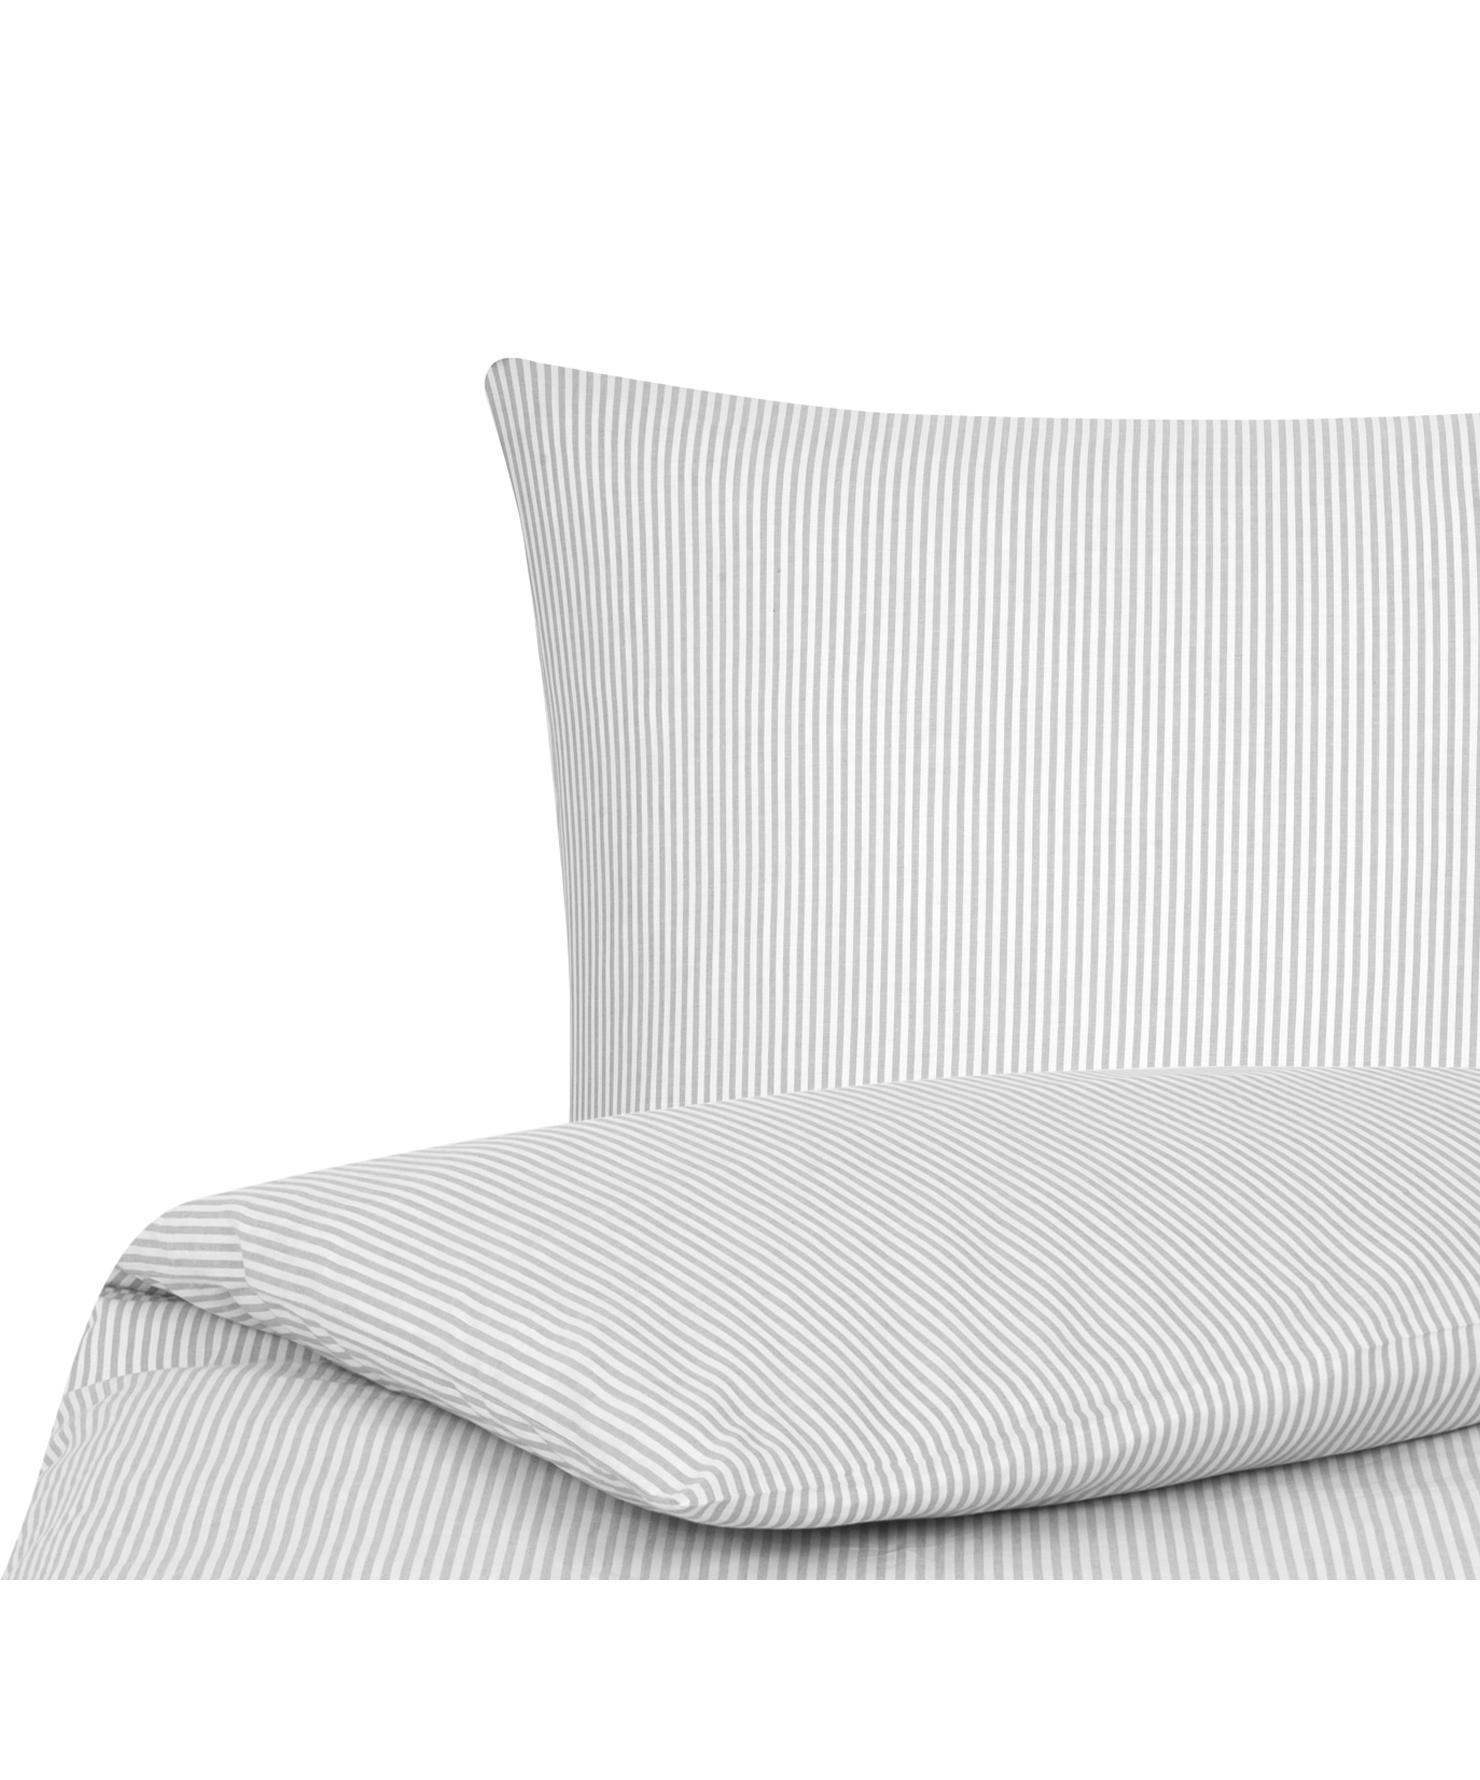 Parure copripiumino in cotone ranforce Ellie, Tessuto: Renforcé, Bianco, grigio, 155 x 200 cm